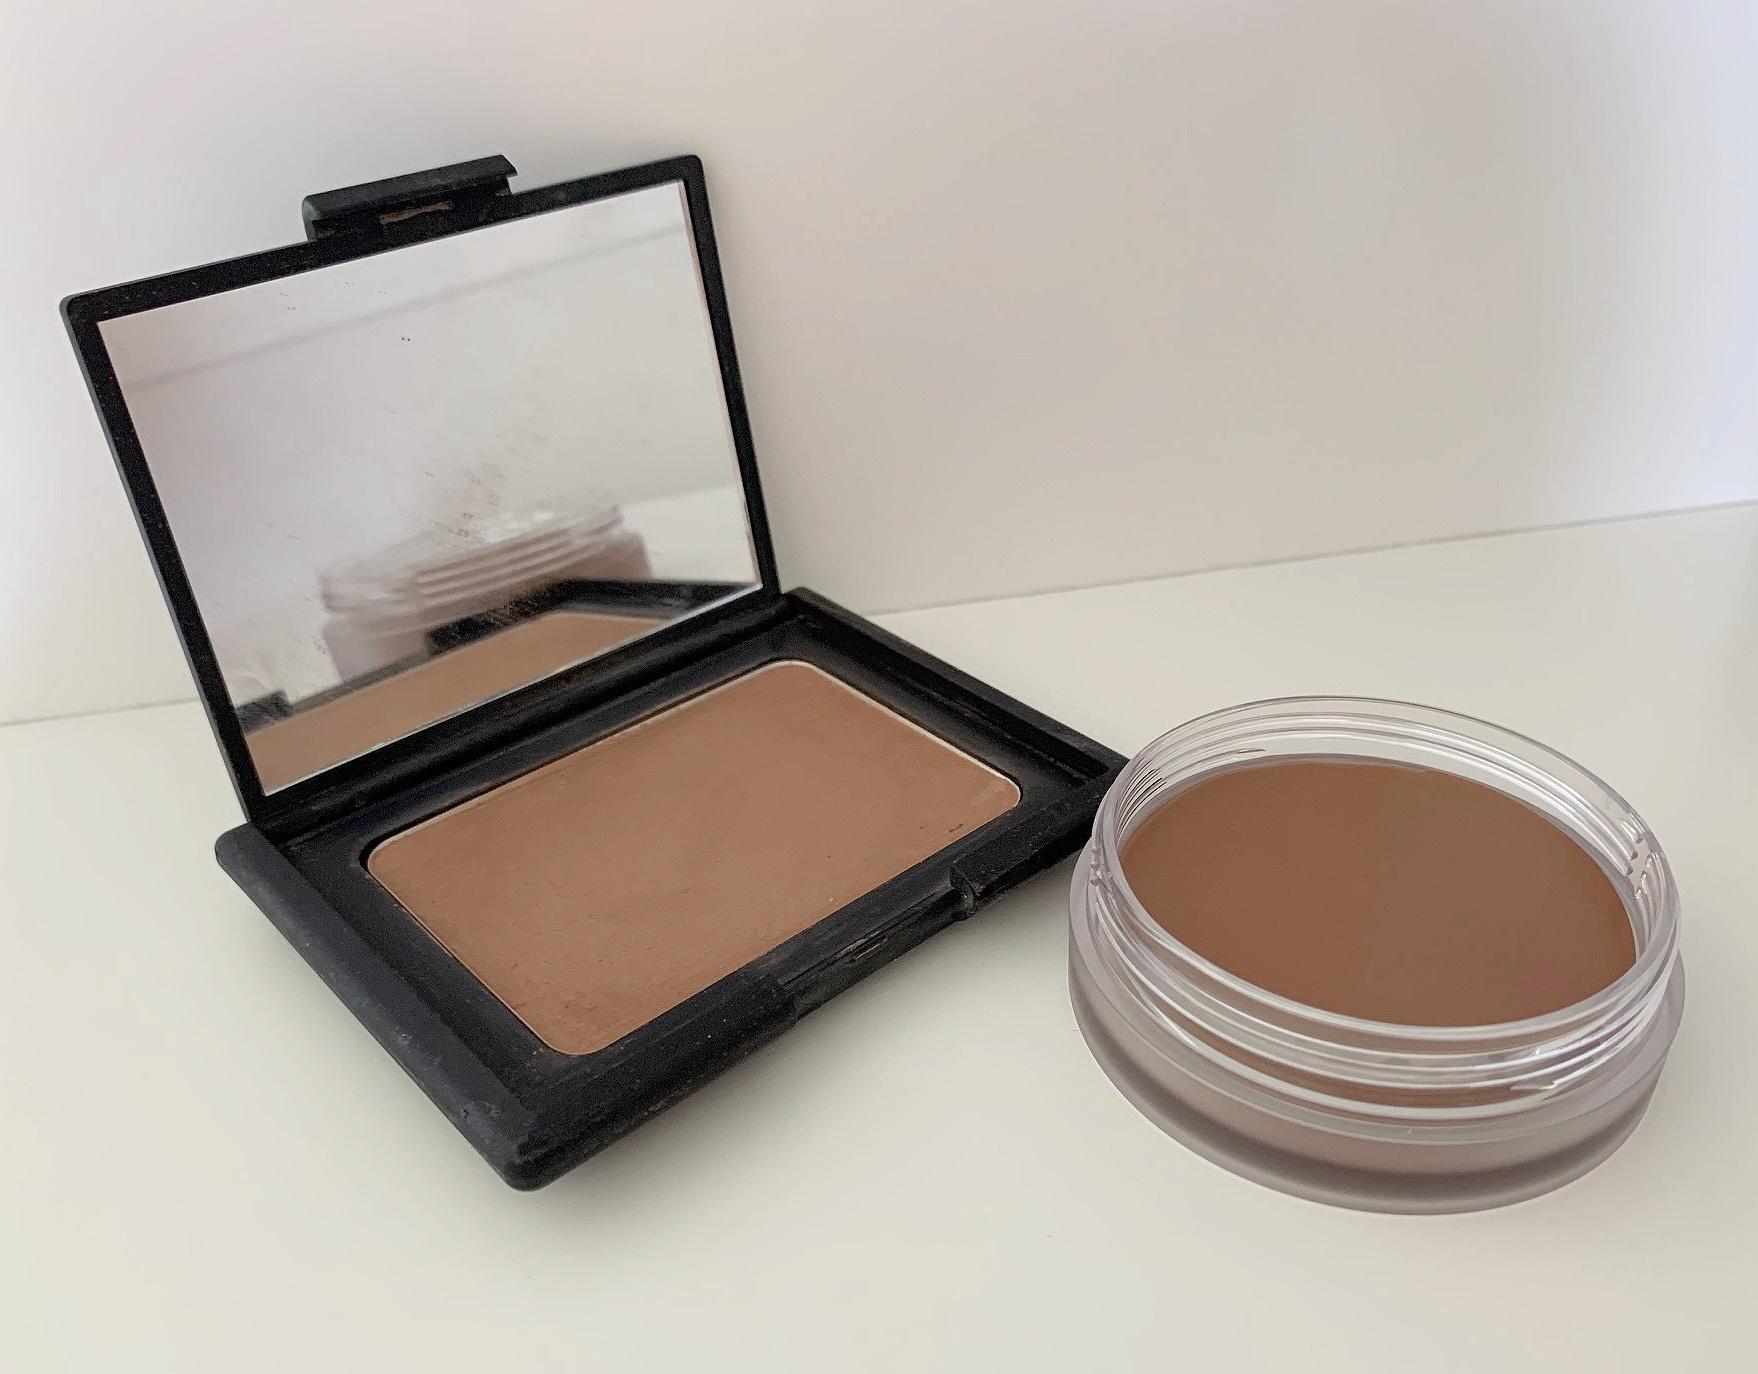 Nars Sunkissed Bronzing Cream Review